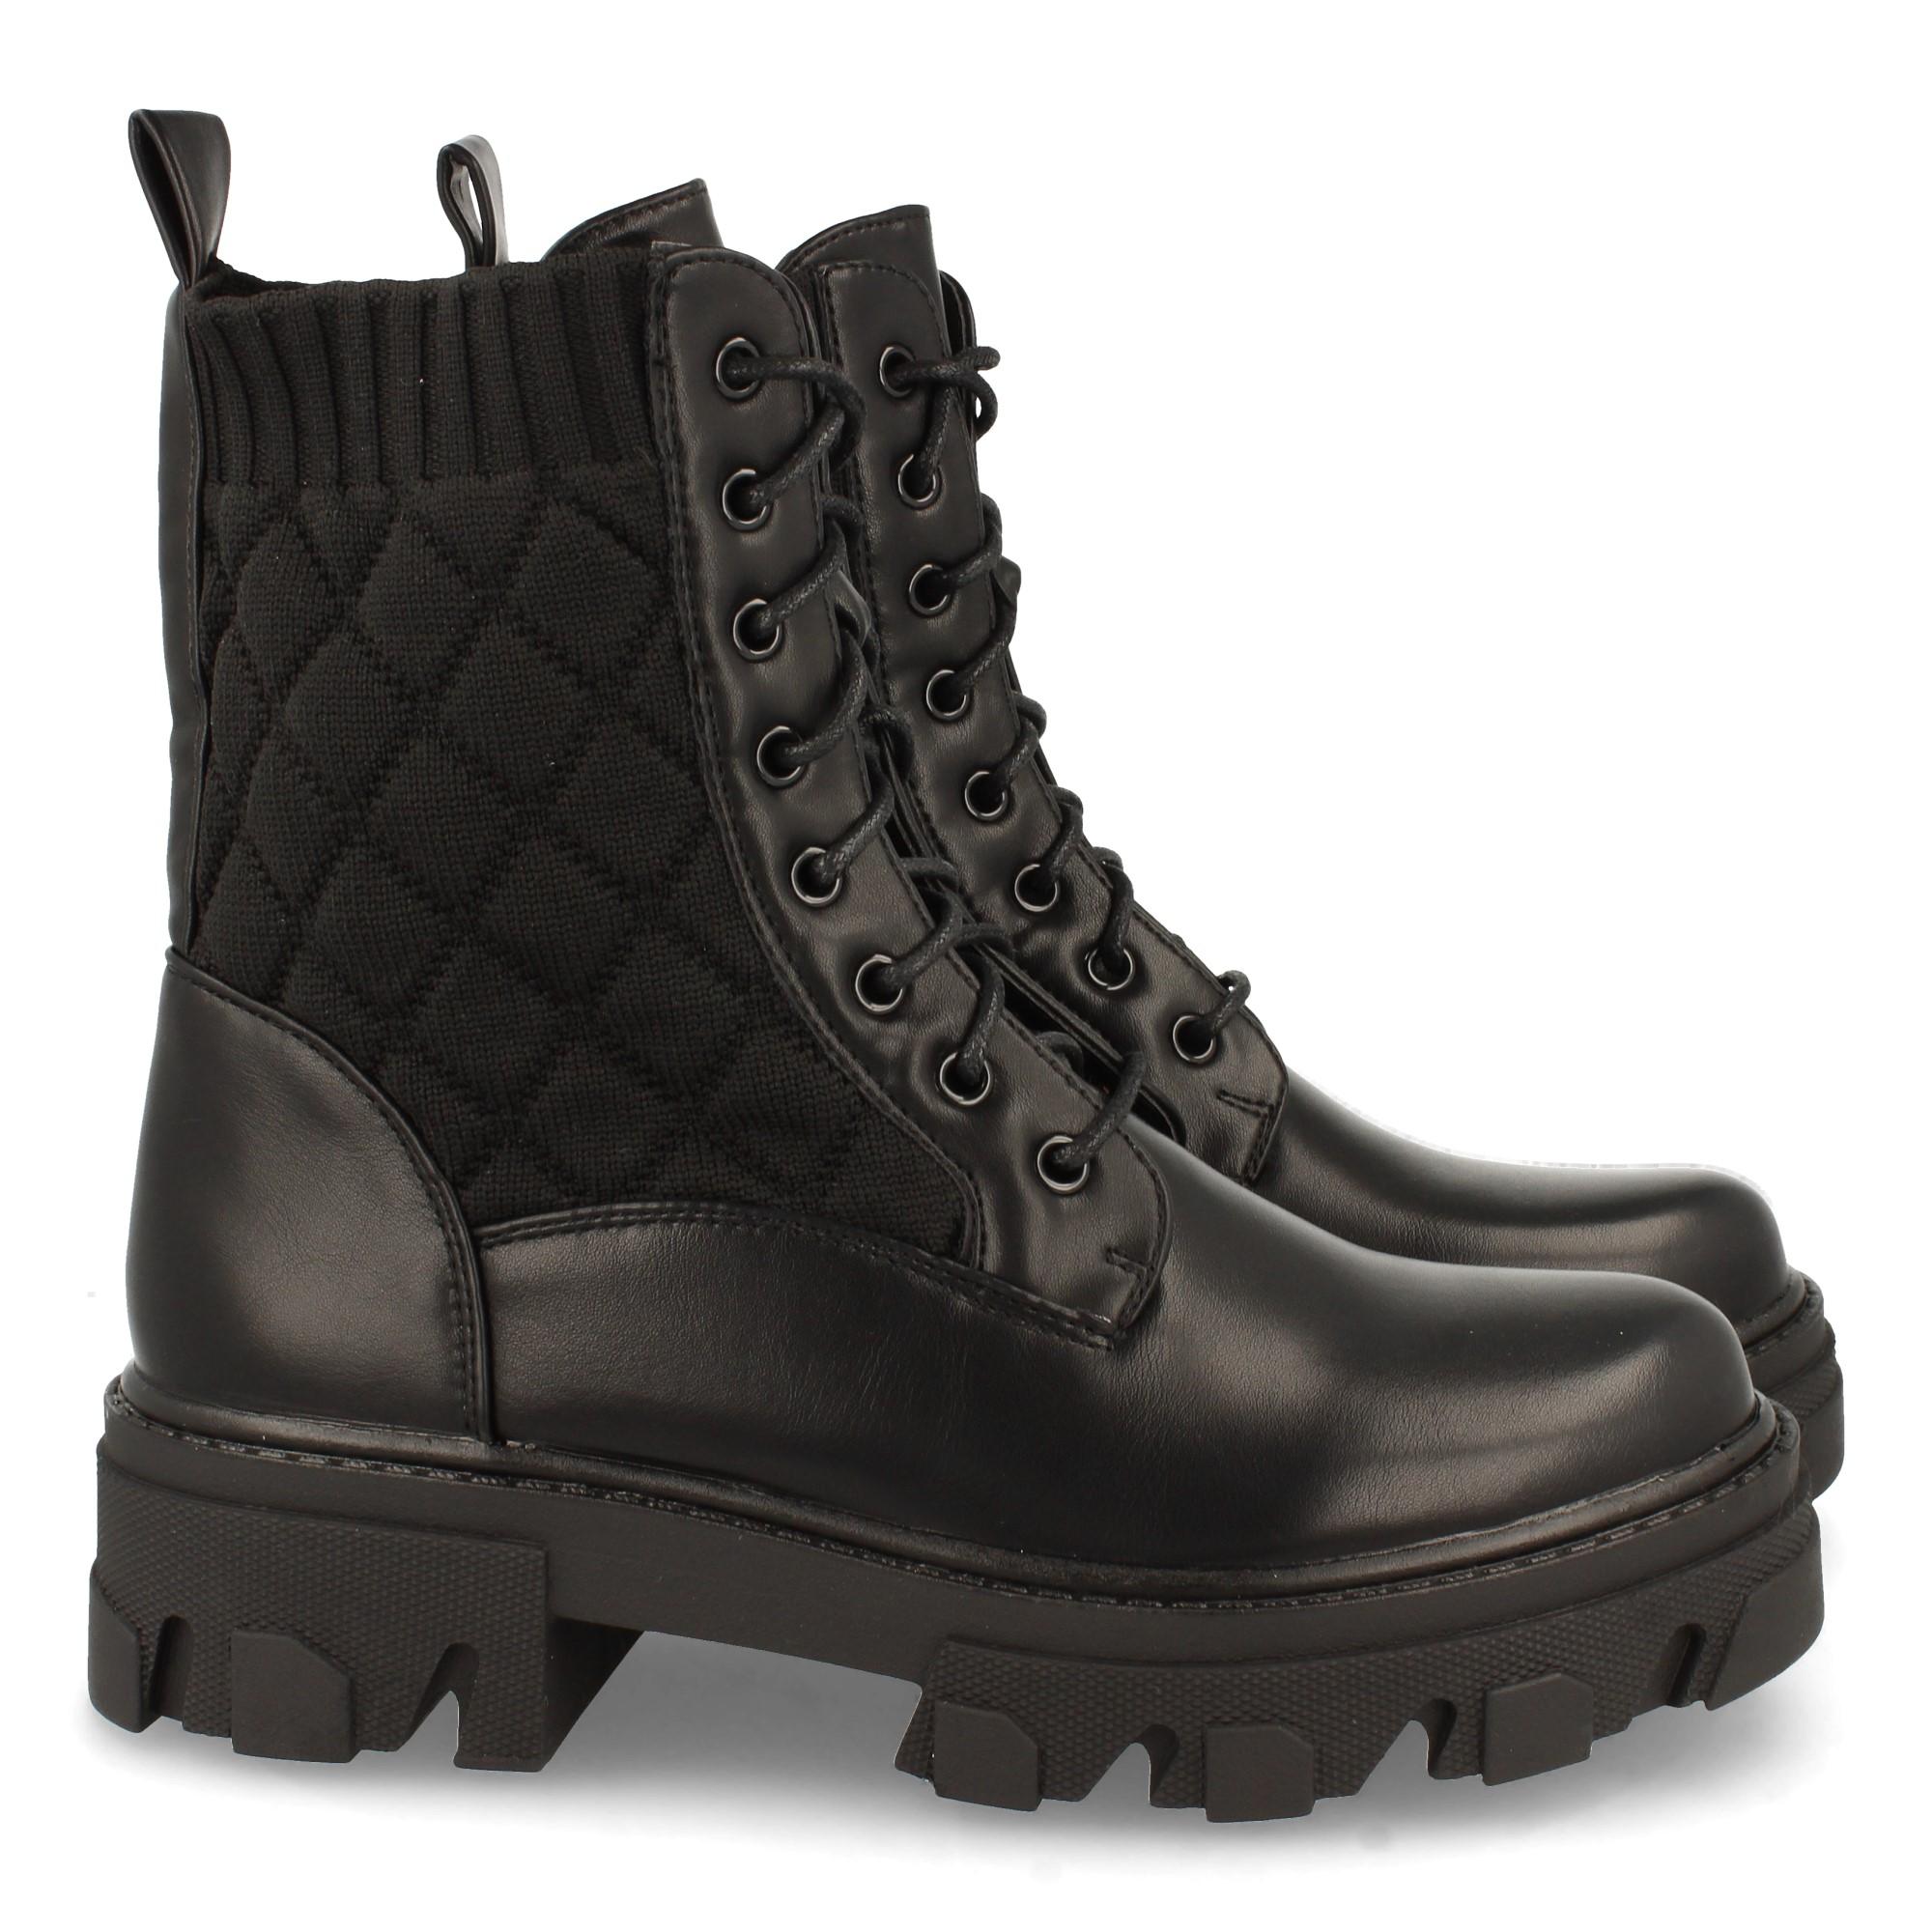 9390-Negro Product Variation